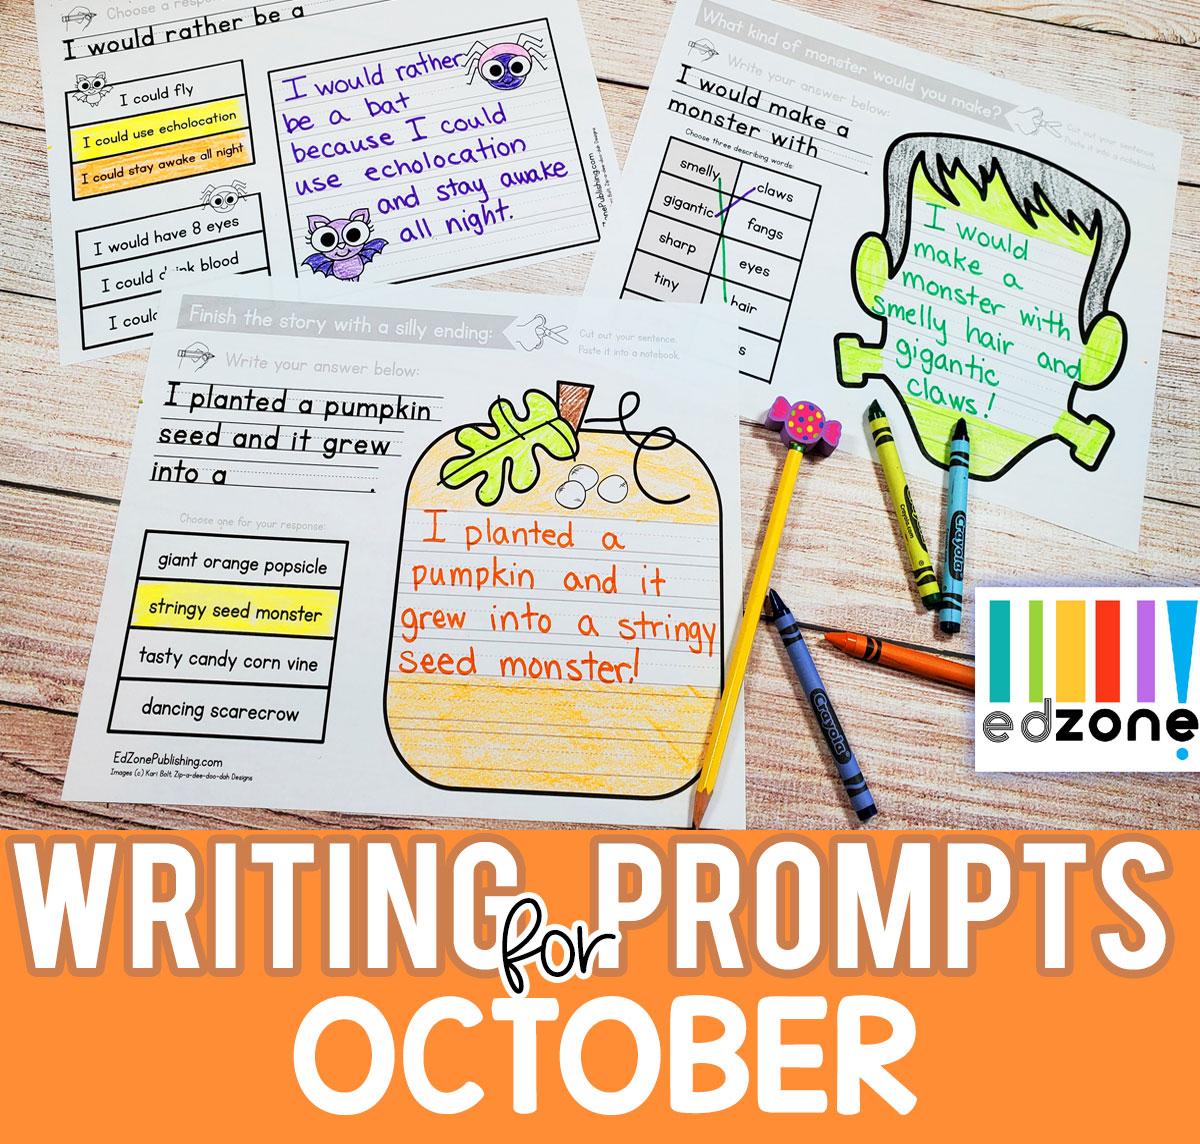 Writingpromptsoctoberw